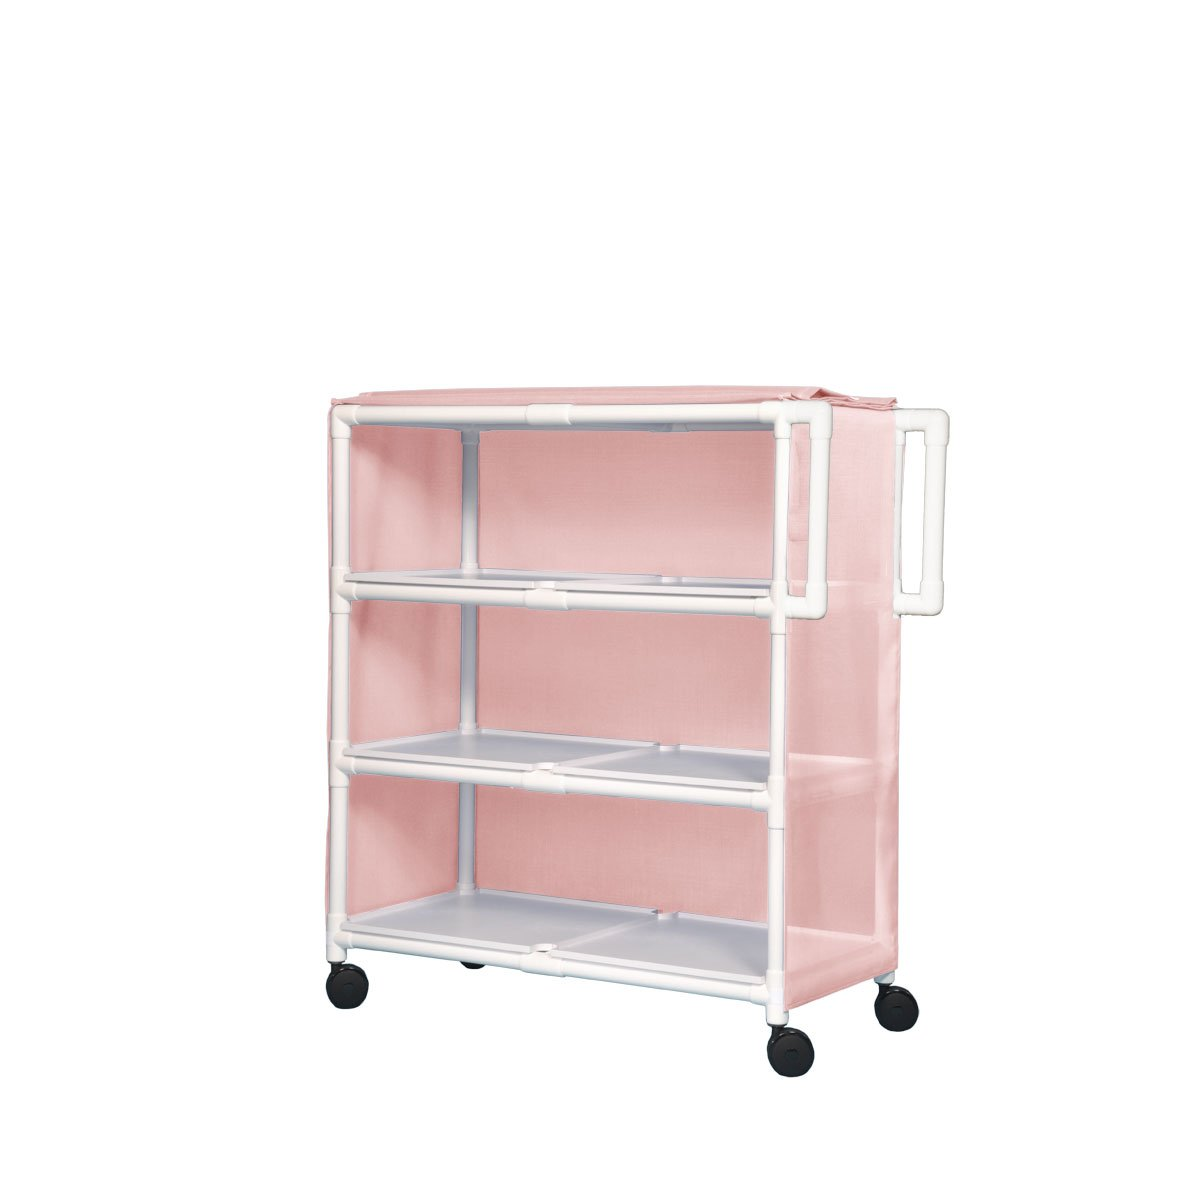 Jumbo Max 62% OFF Linen Cart - Three Chek Sure Camo Shelves Pink Philadelphia Mall